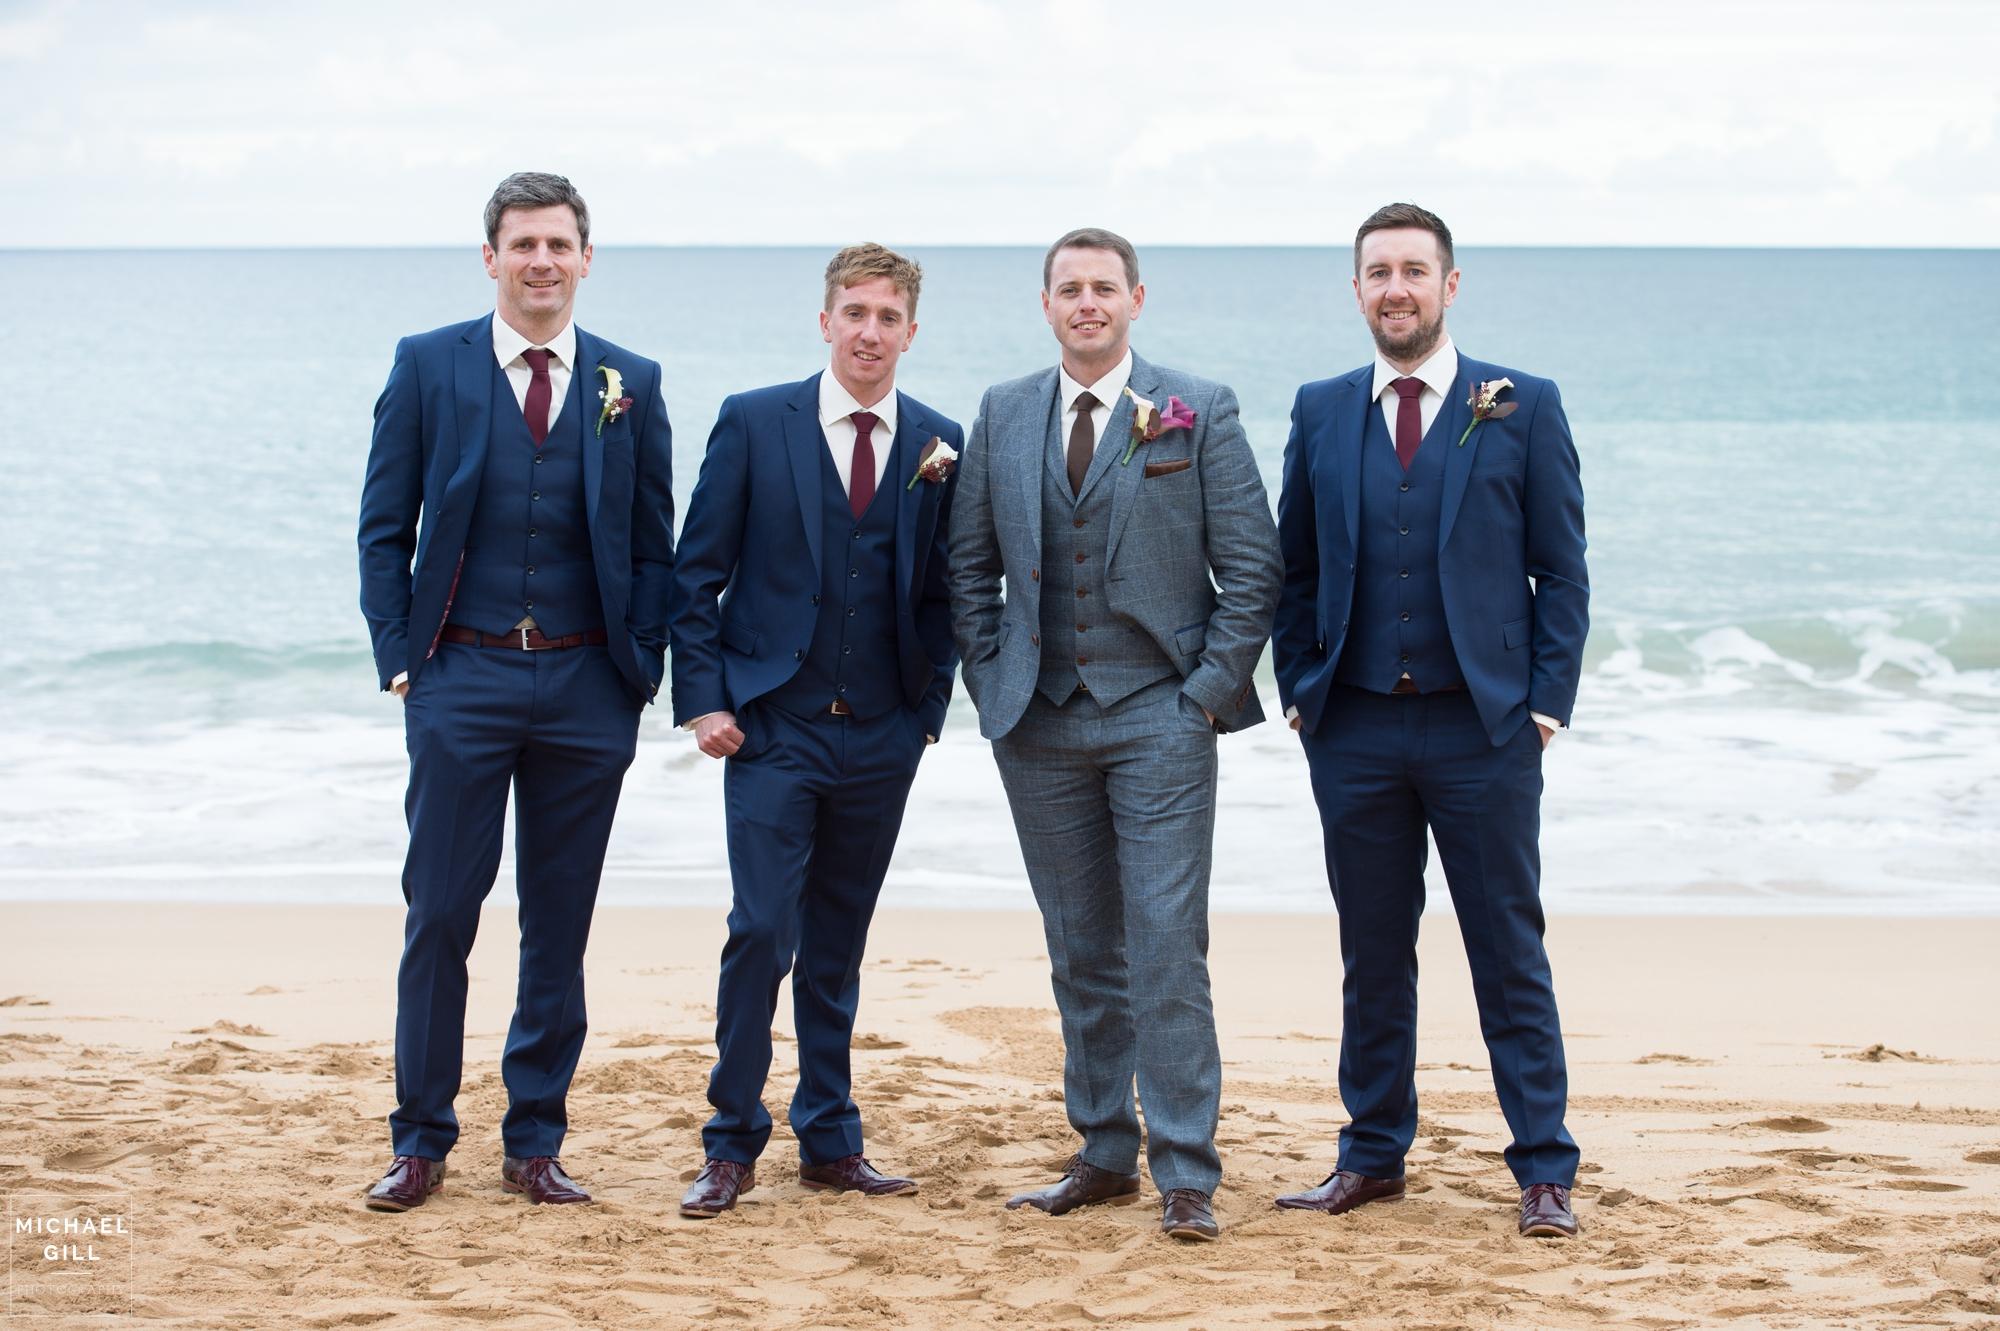 Michael_Gill_Photography_Kinnego_Redcastle_Hotel_Wedding6 (1).jpg